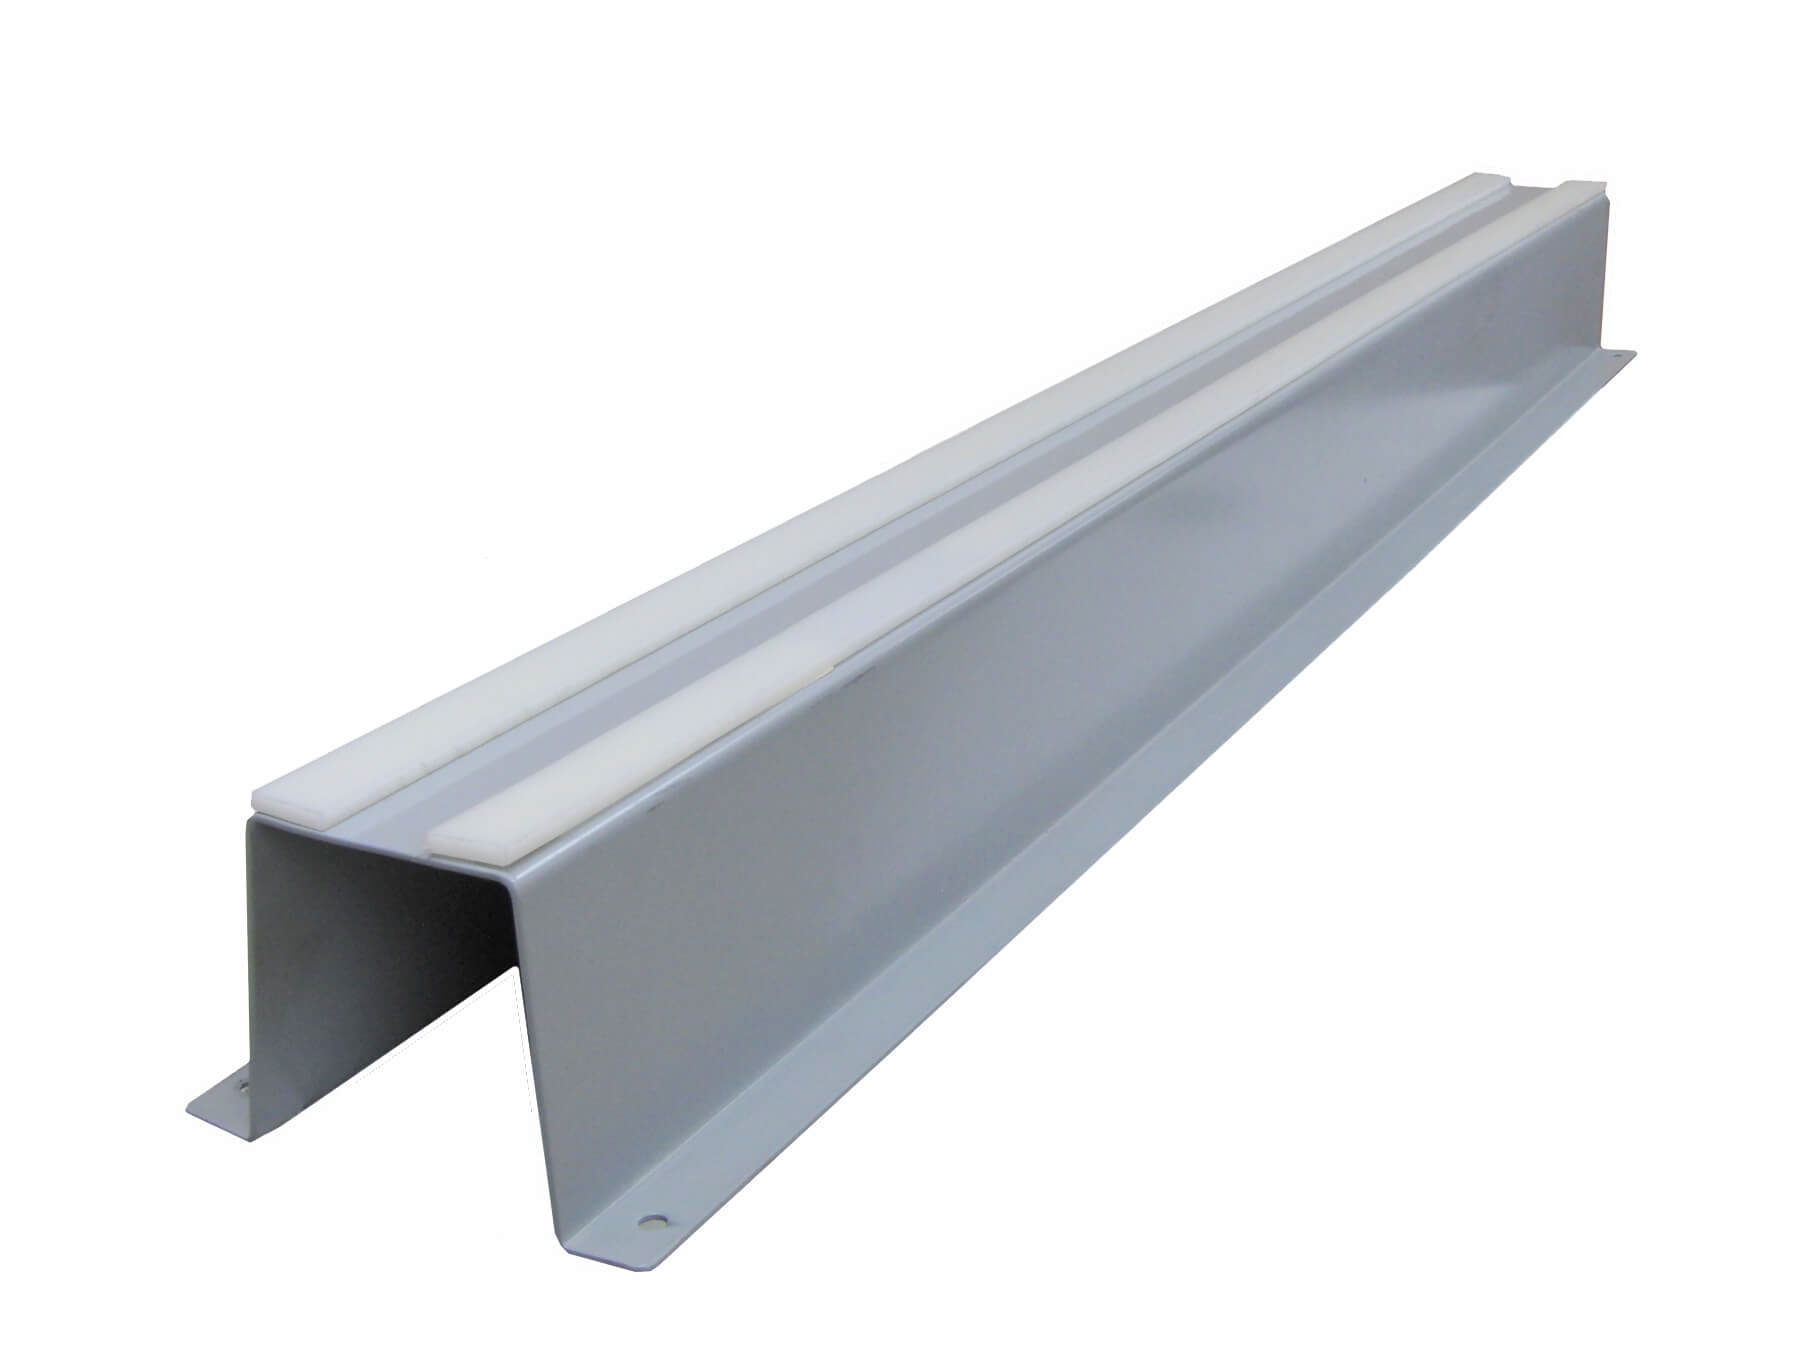 Center Rail for Multi-Purpose Storage Rack – CR-5